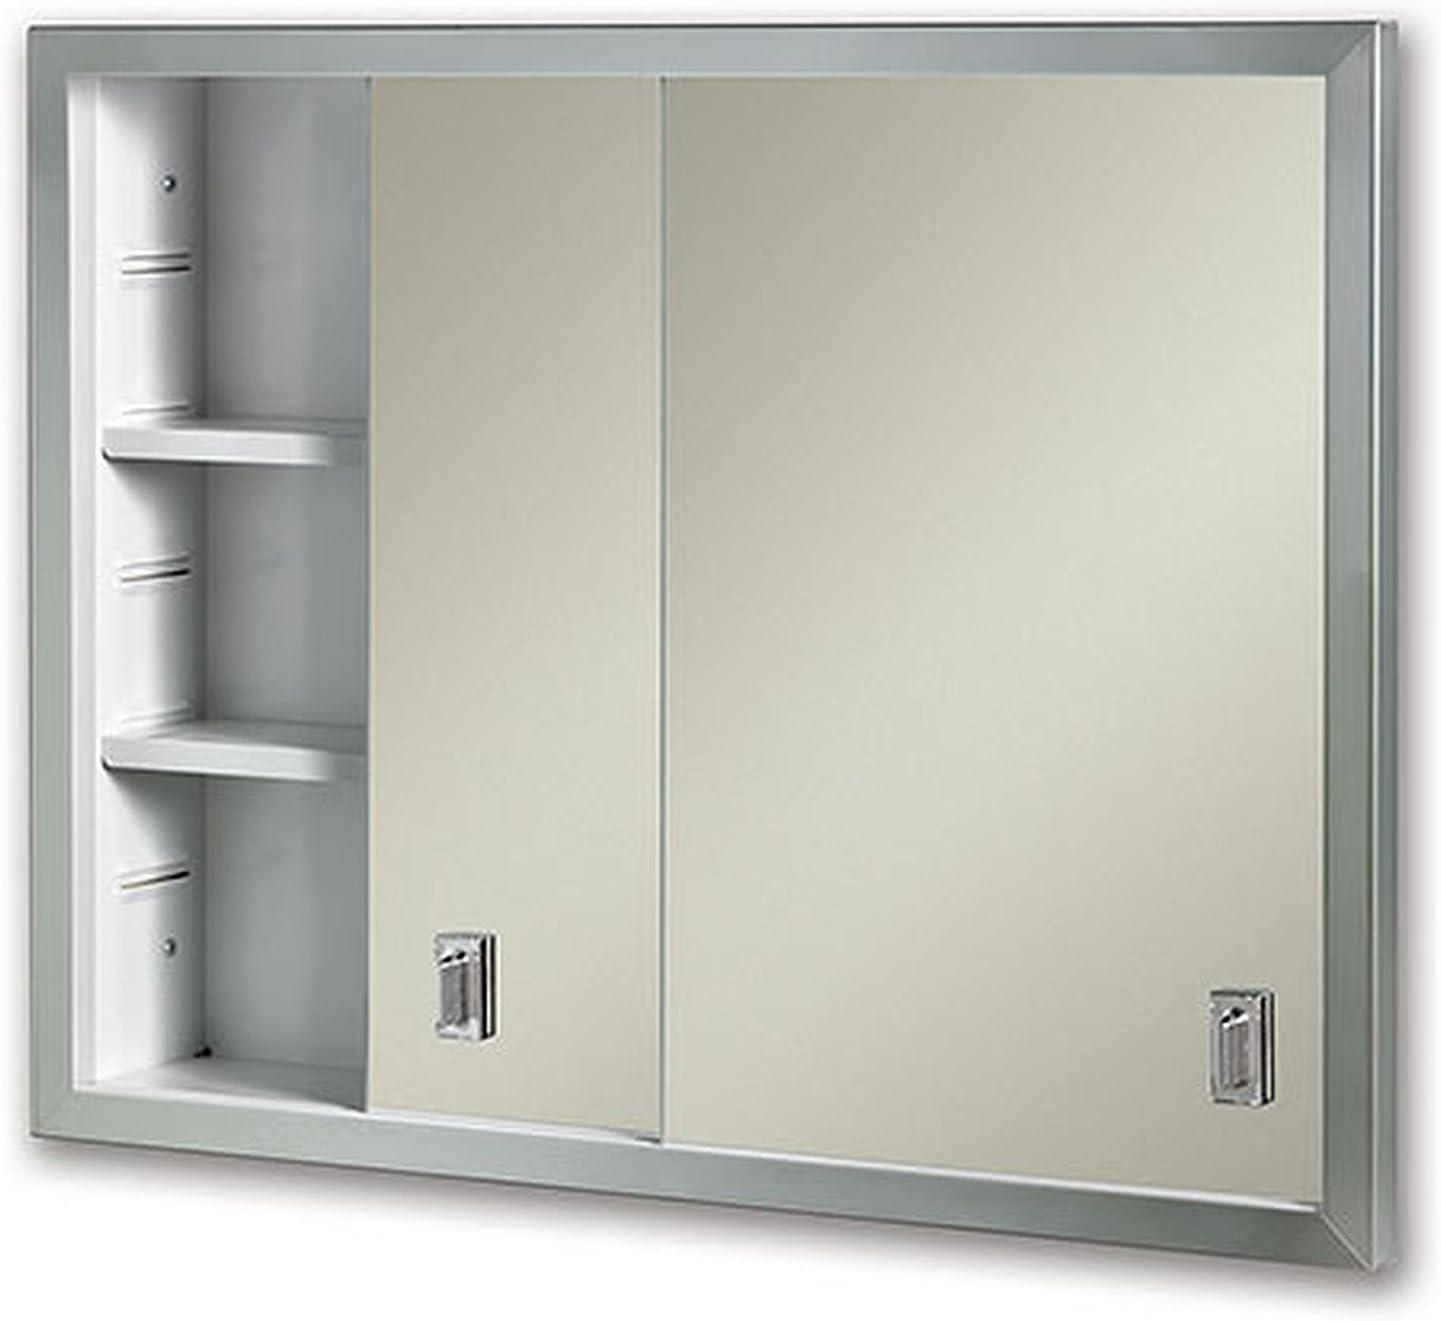 Amazon Com Jensen B704850x Sliding Doors Medicine Cabinet 24 X 19 25 Home Improvement